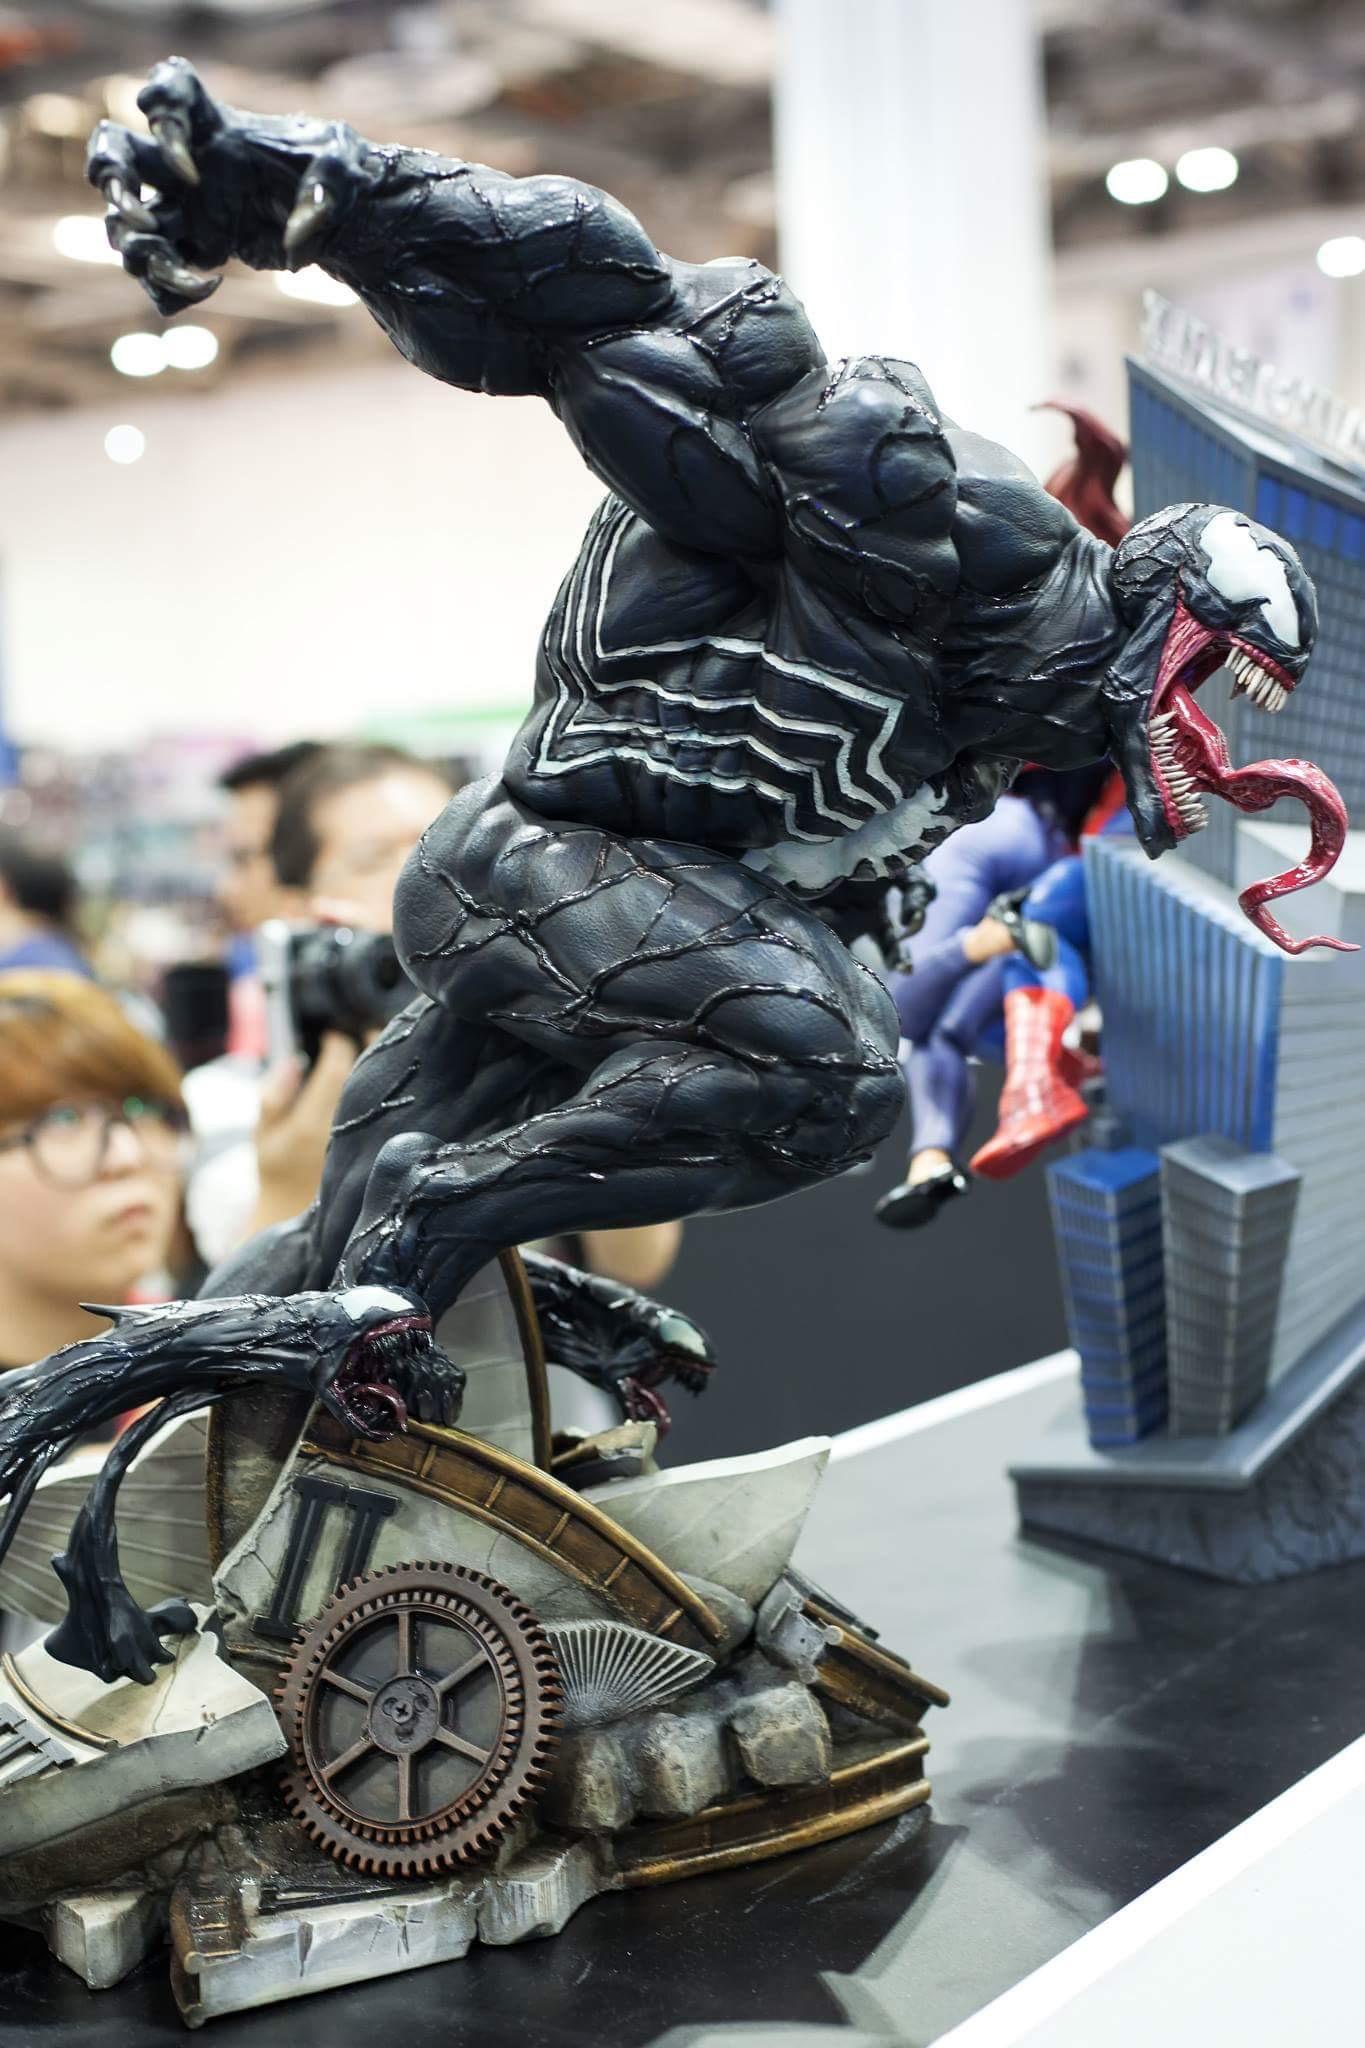 Premium Collectibles : Venom - Comics Version - Page 3 Image_1473695510